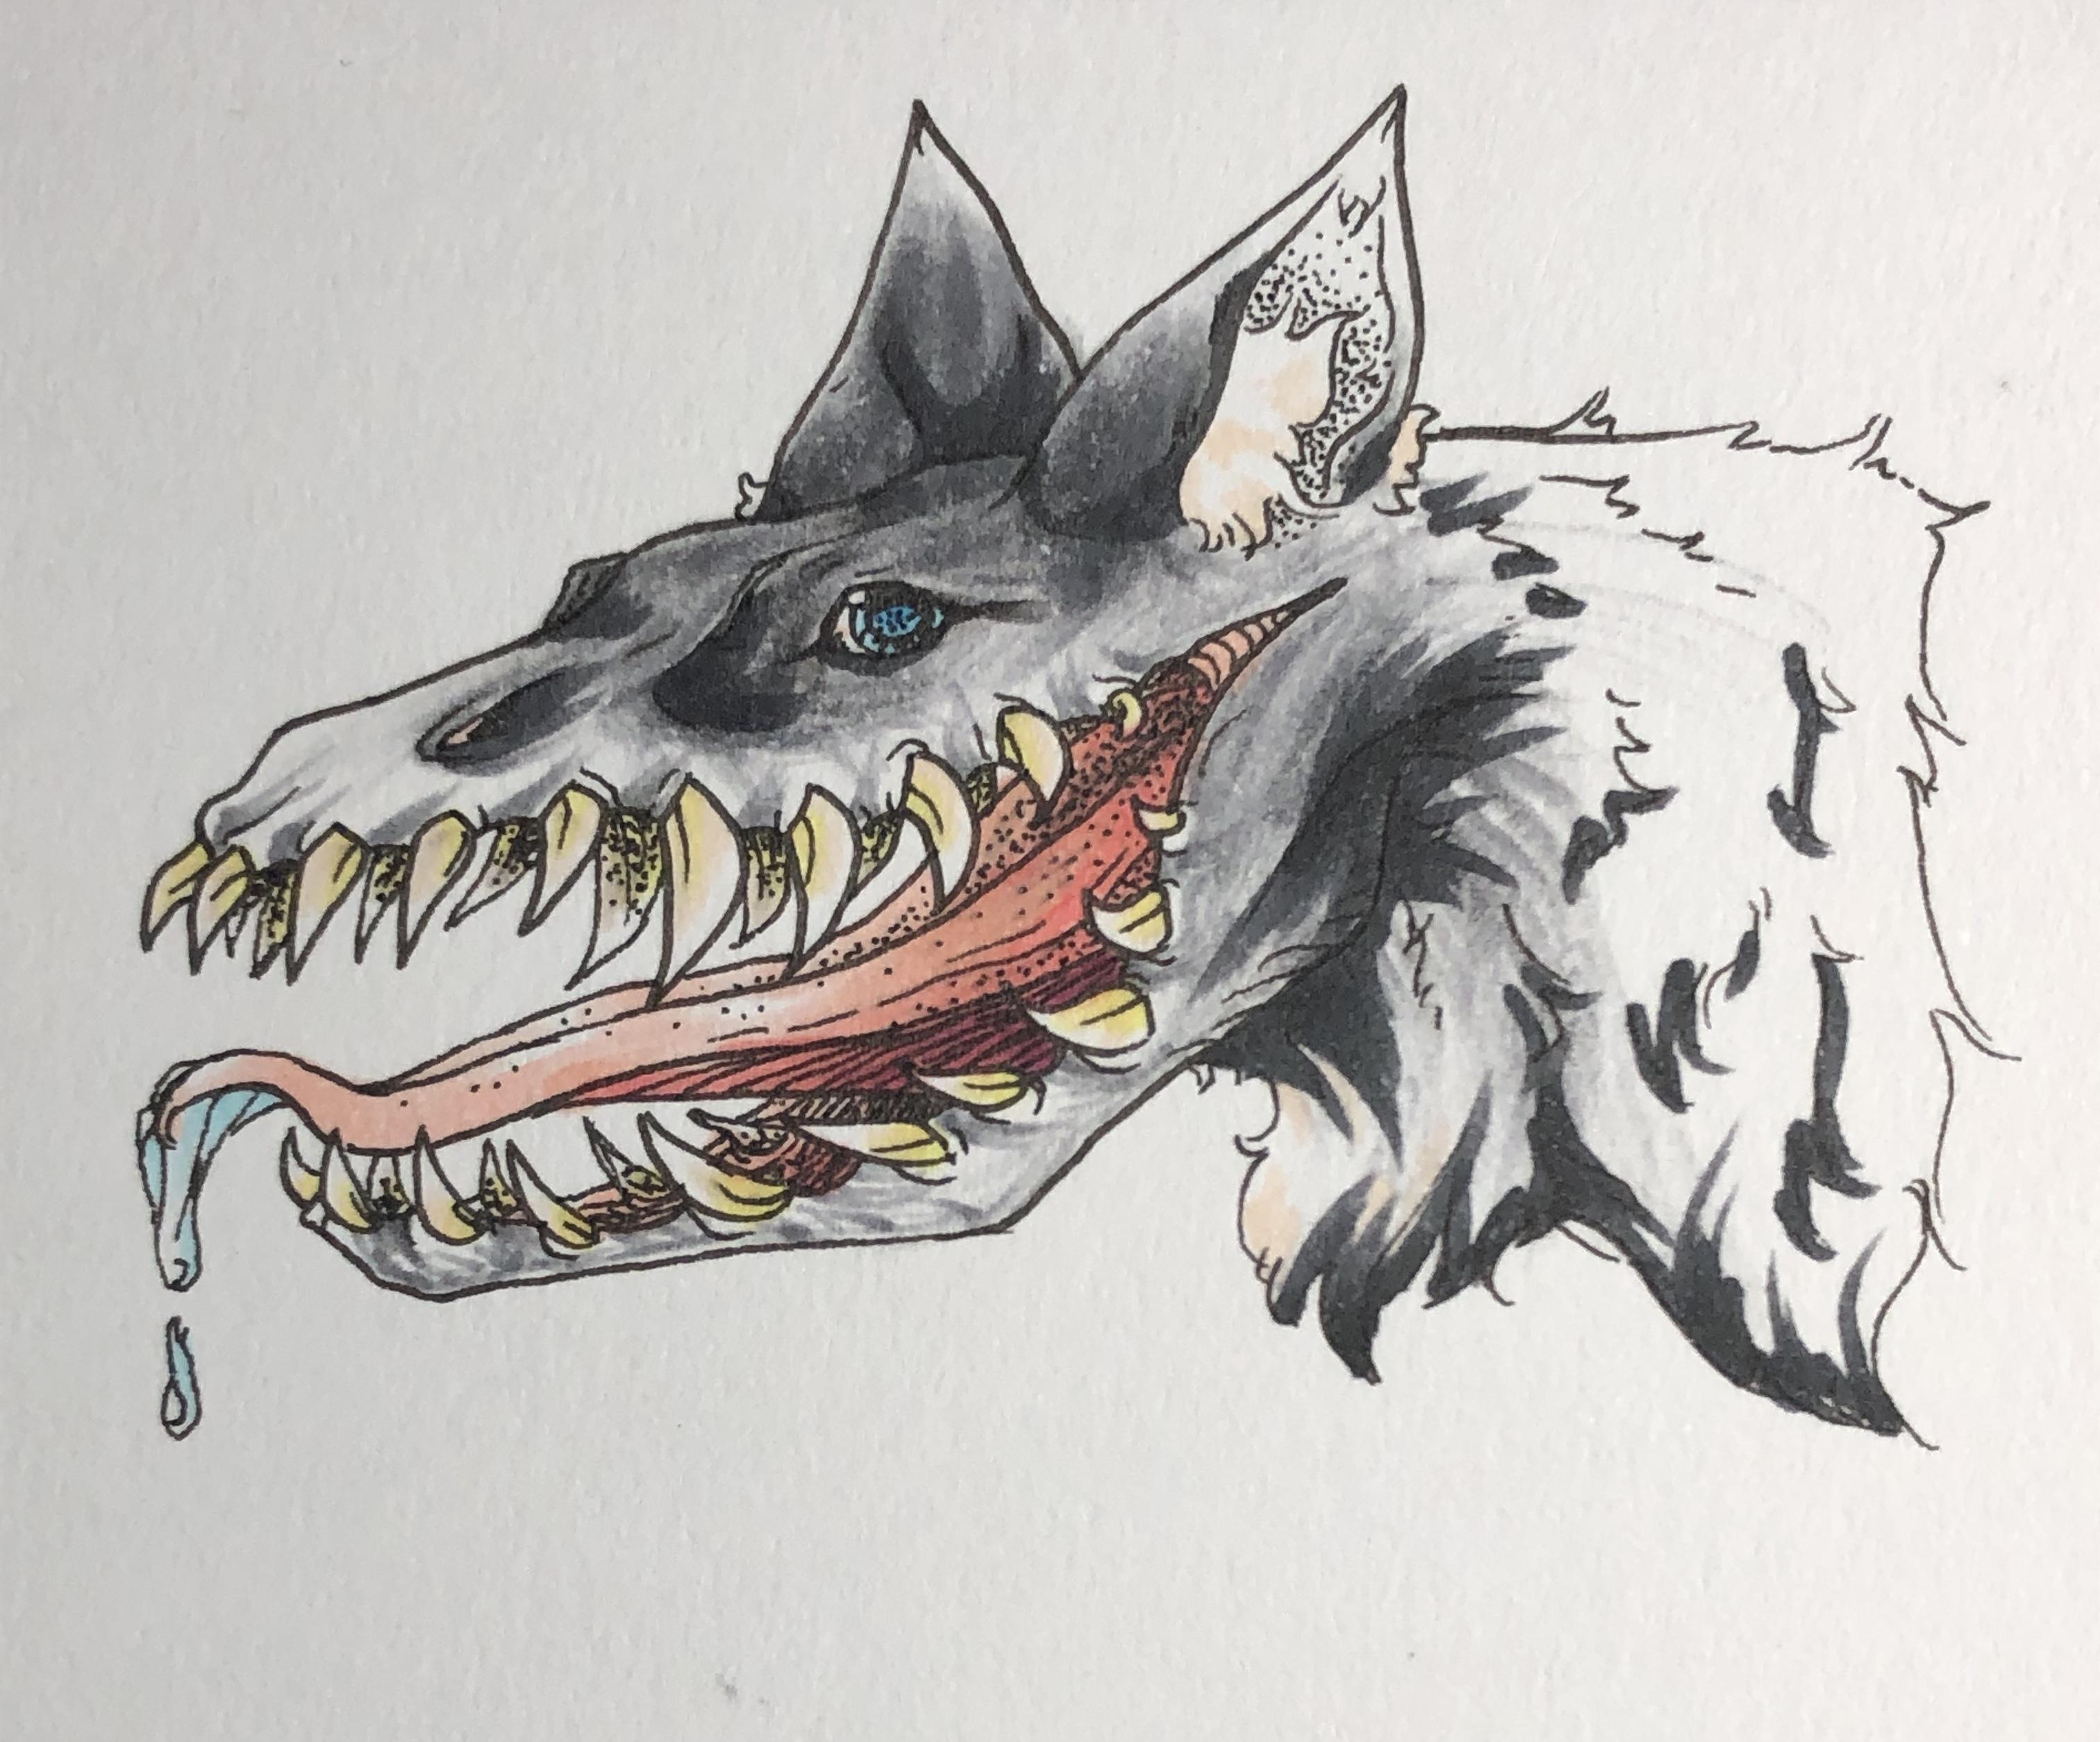 Monster Doggo